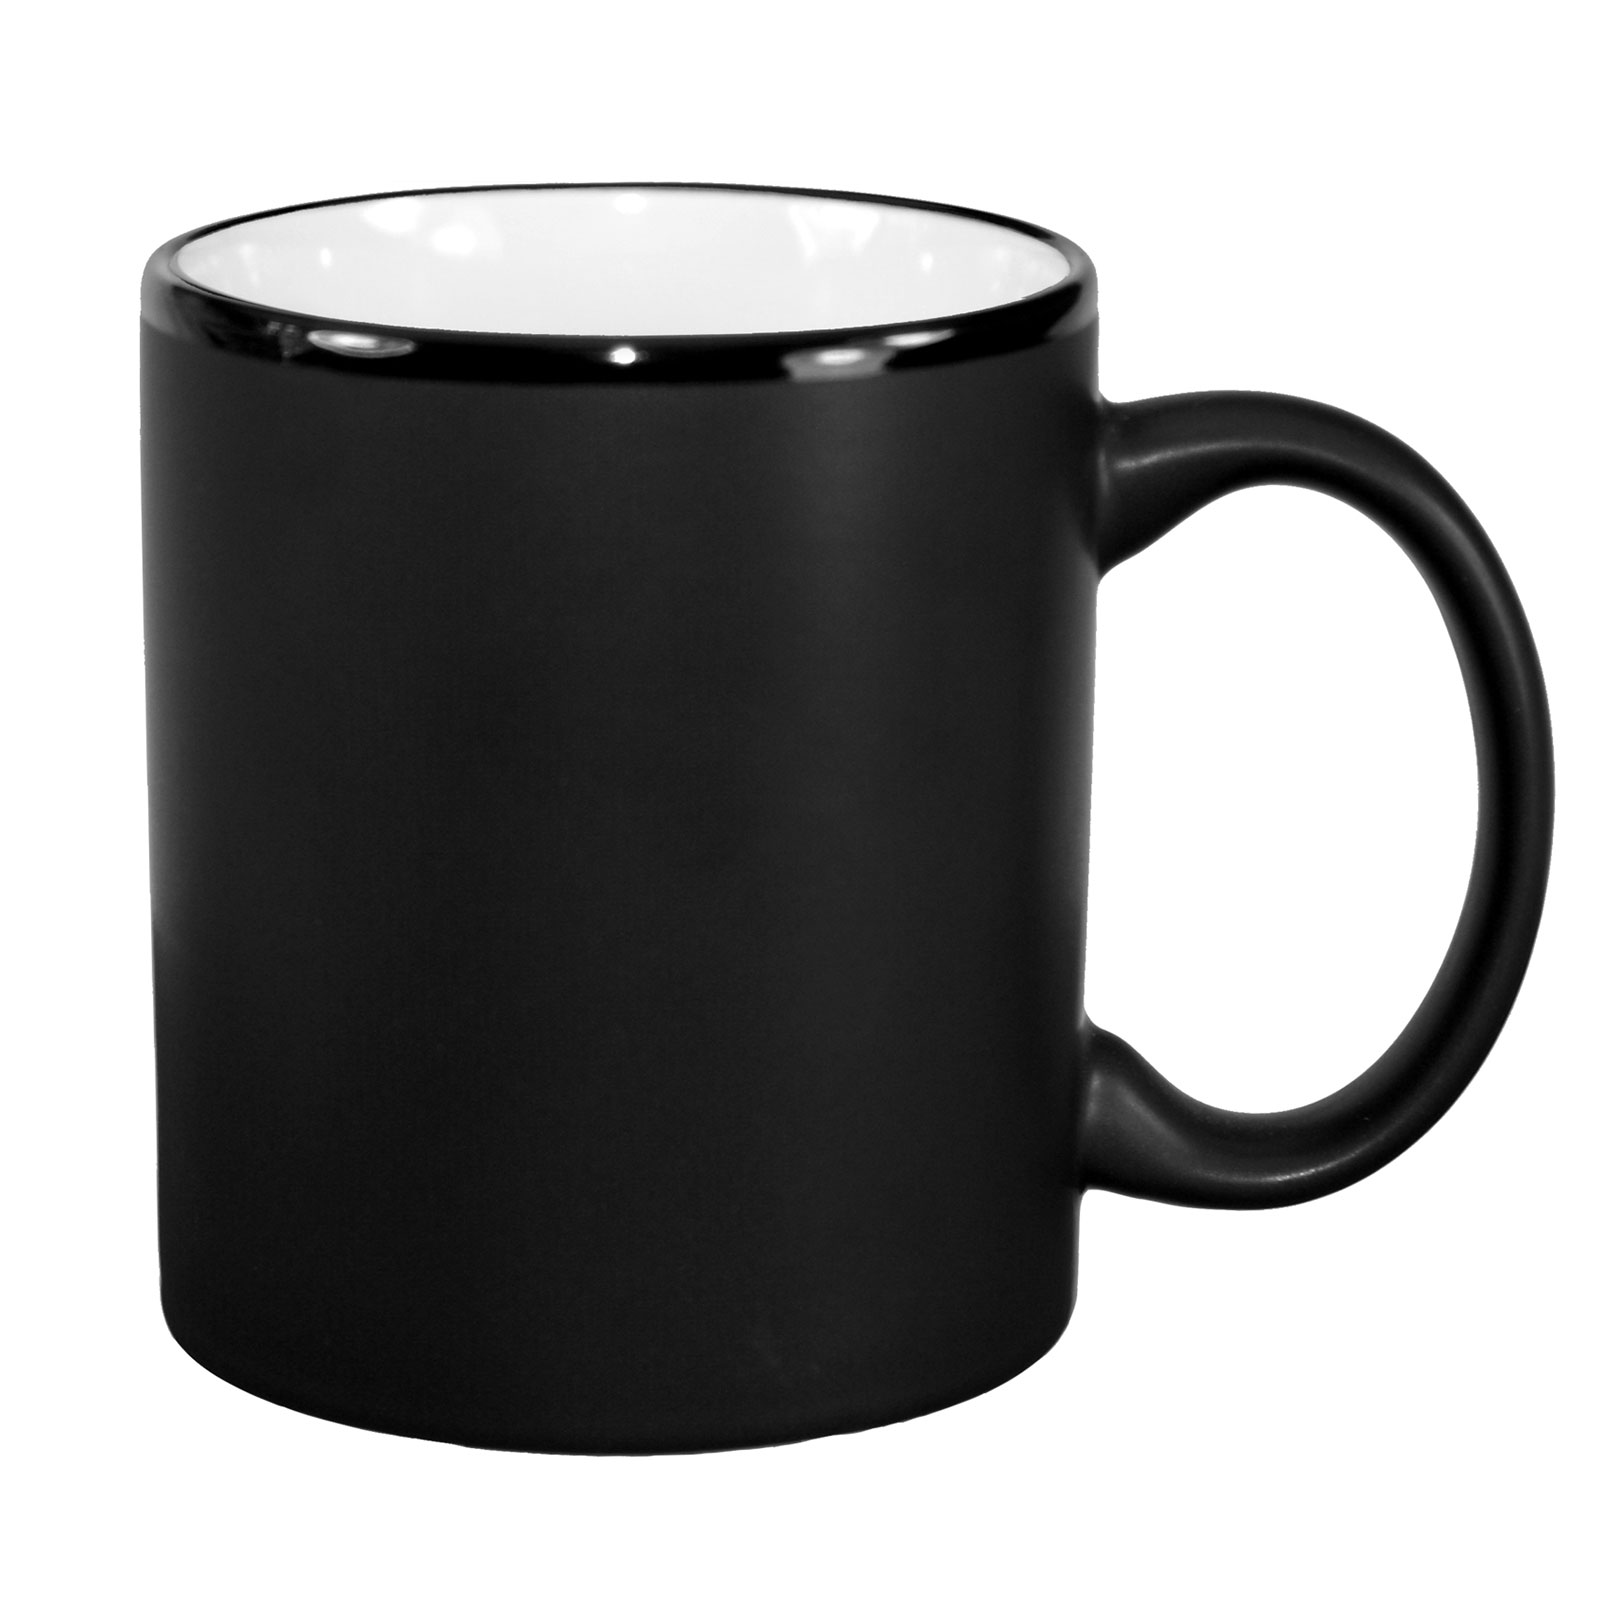 International Tableware 87168-02/05MF-05C mug, china